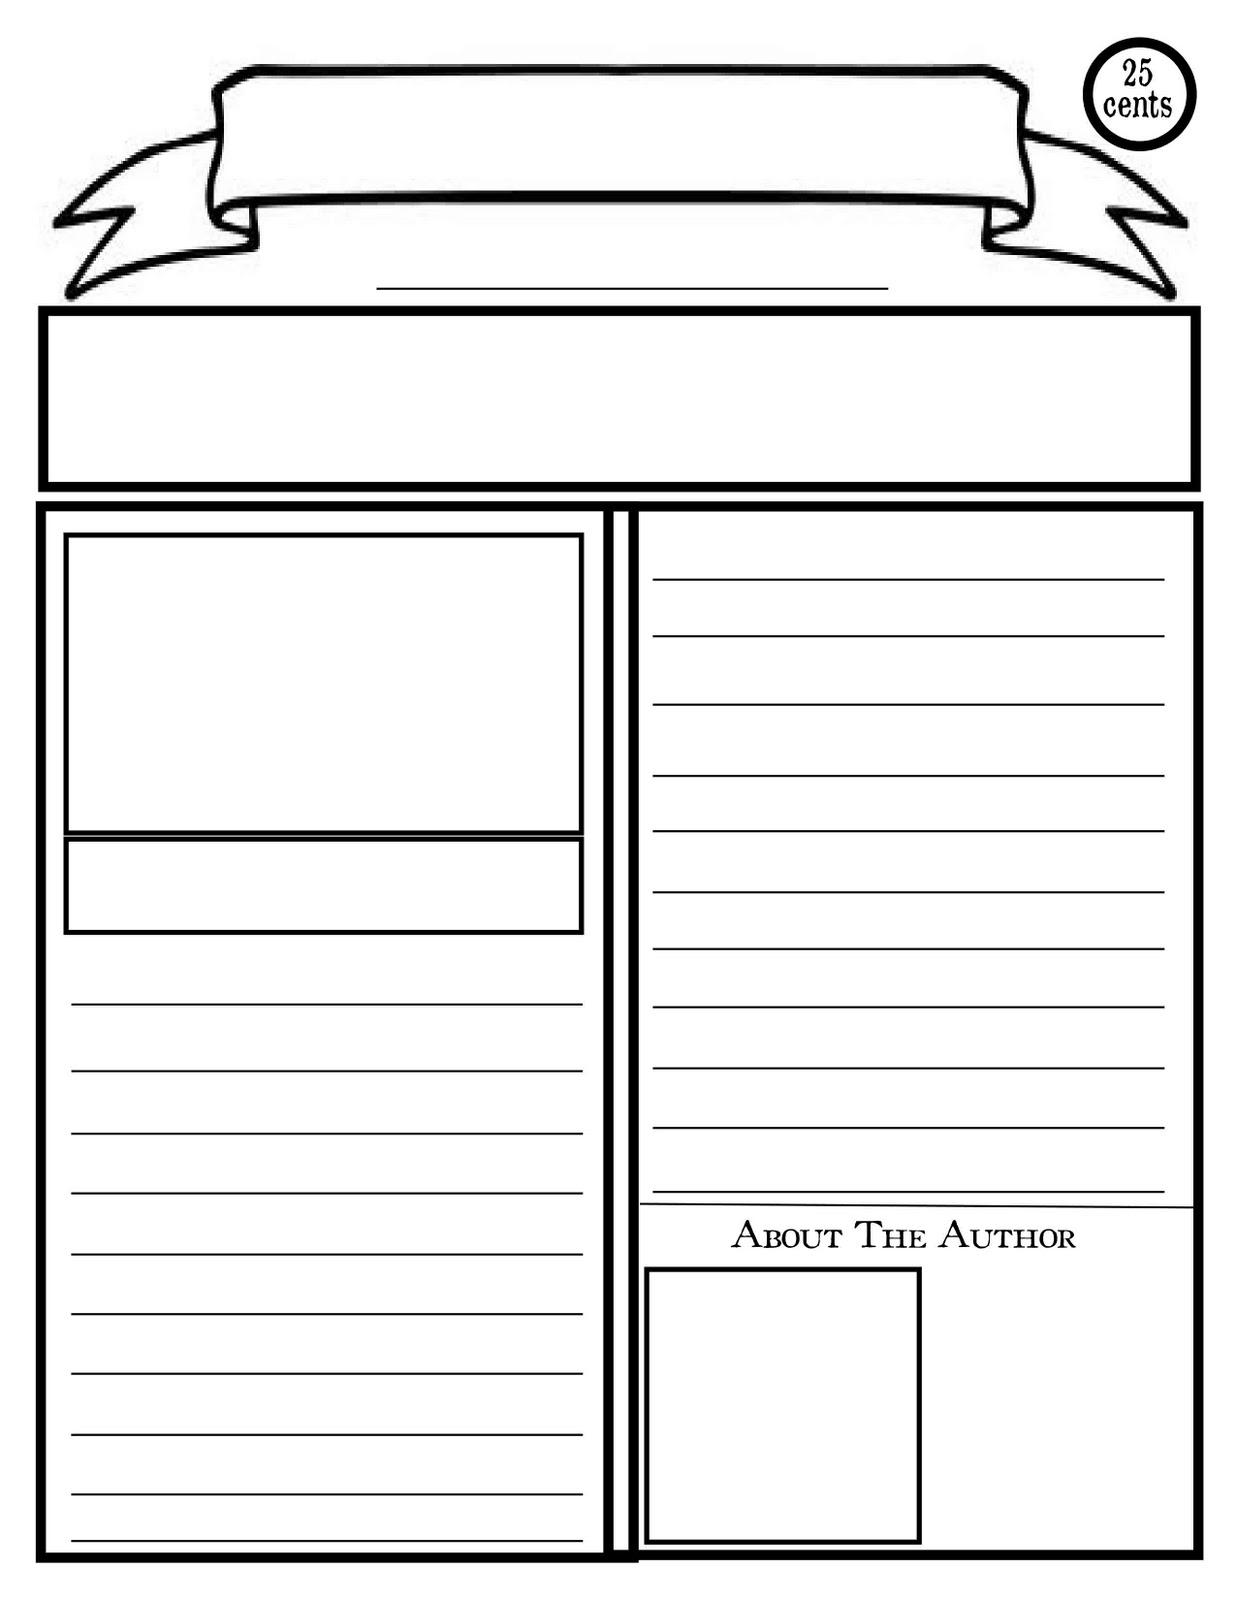 Paper clipart worksheet Clipart Clipart Newspaper blank%20newspaper%20clipart Clipart